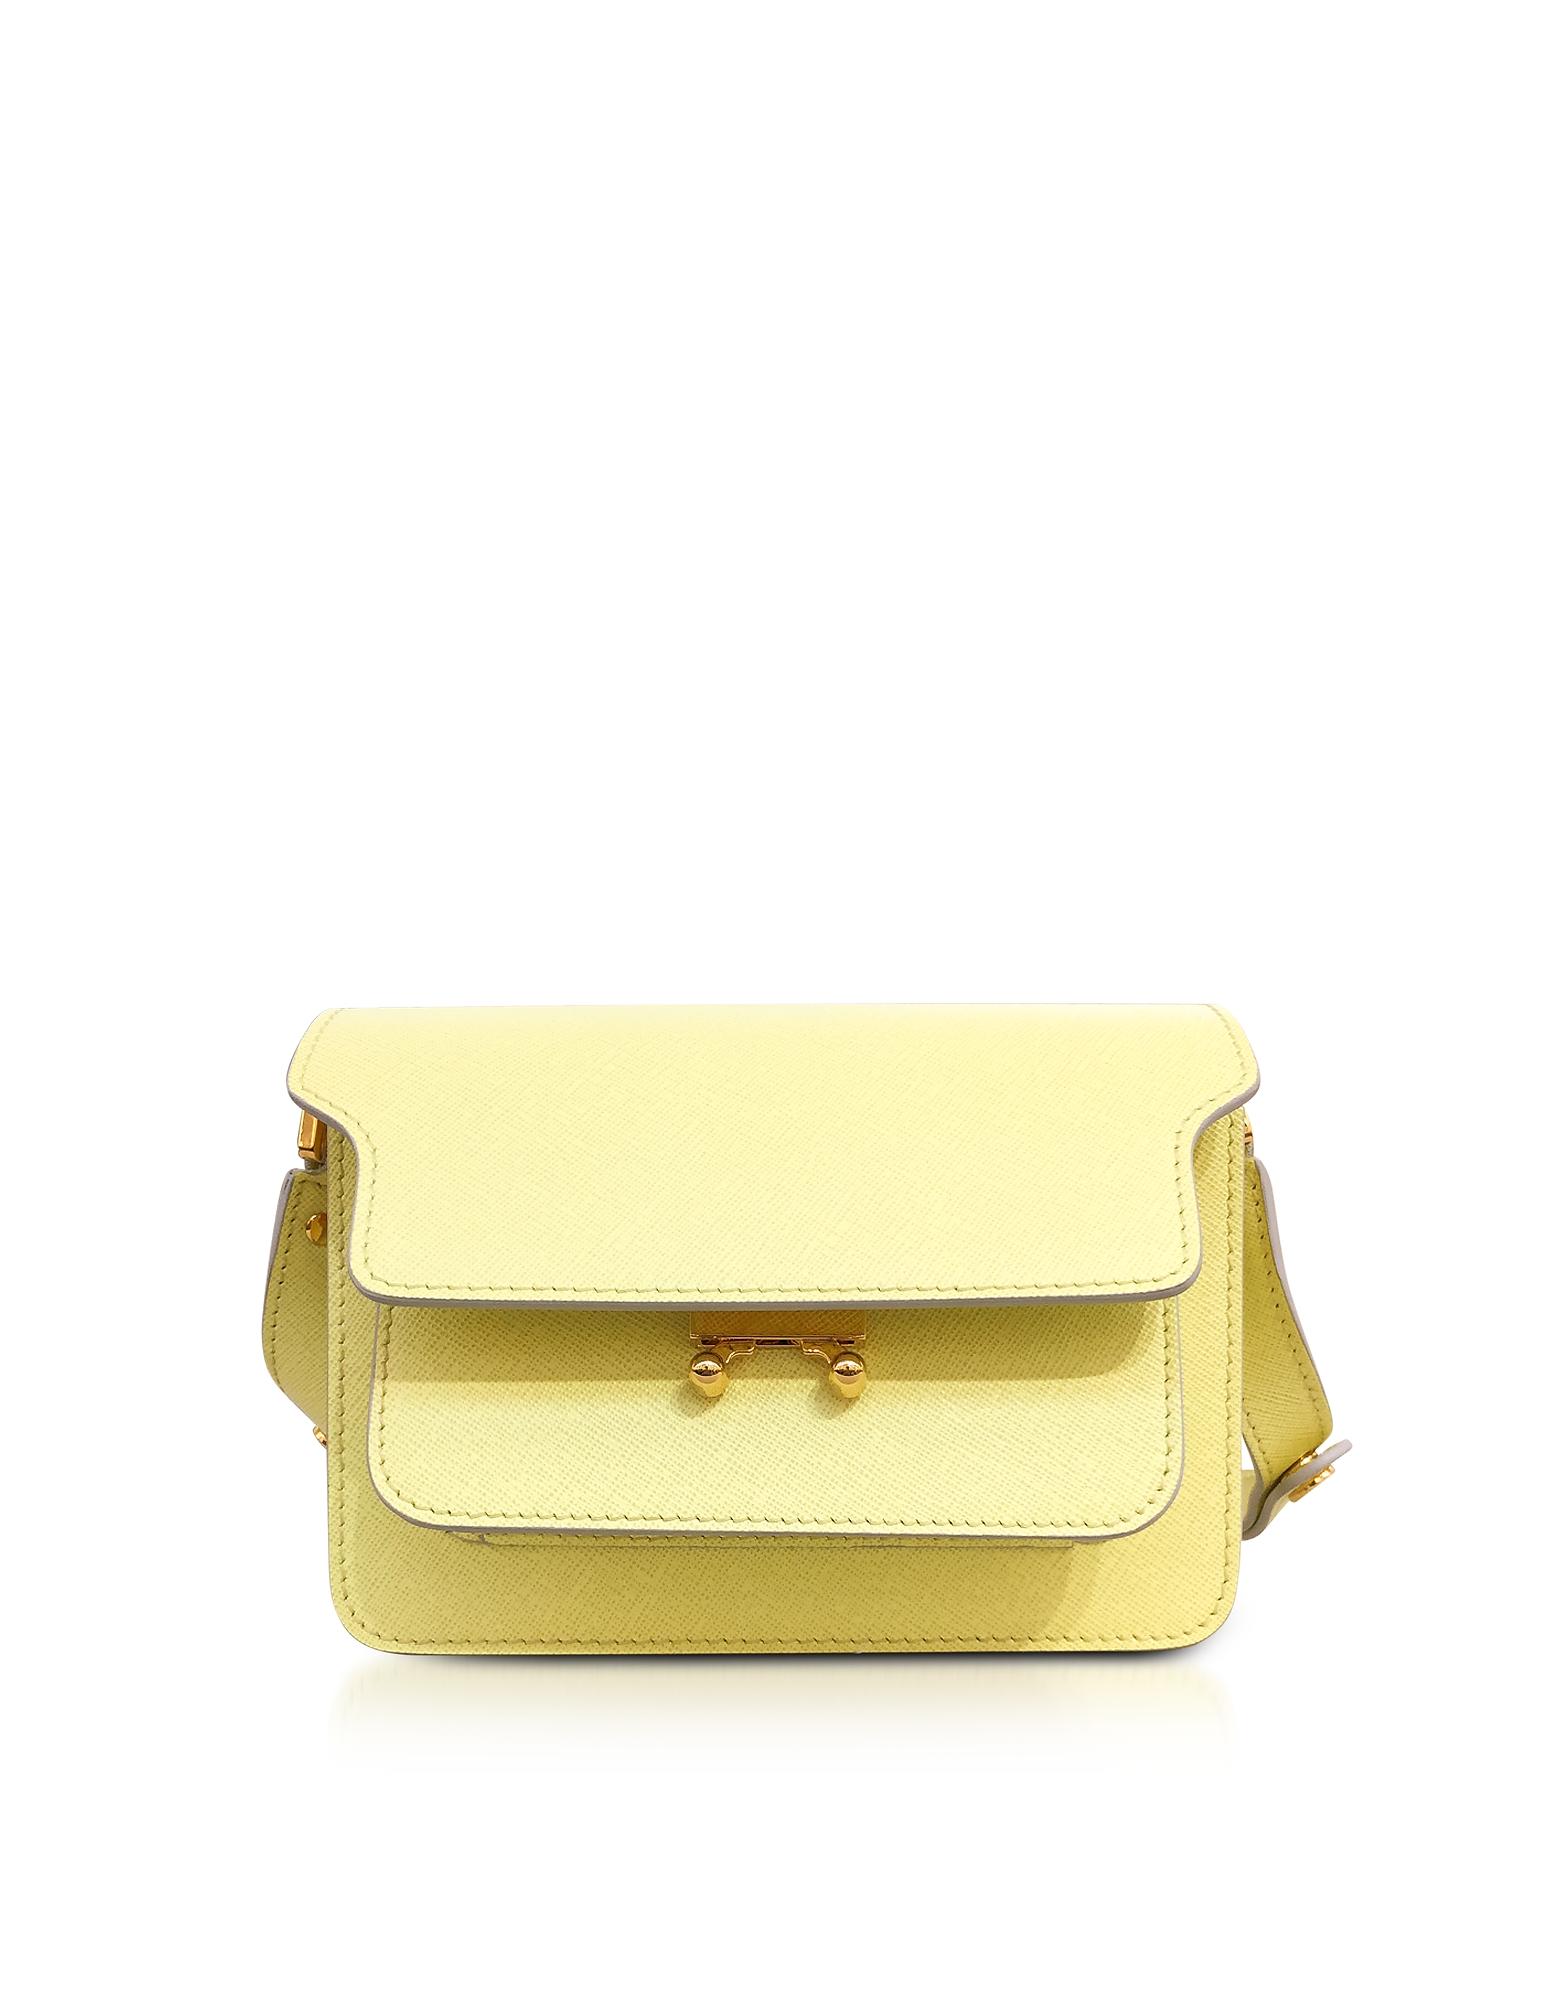 Marni Handbags, Vanilla Saffiano Leather Trunk Bag